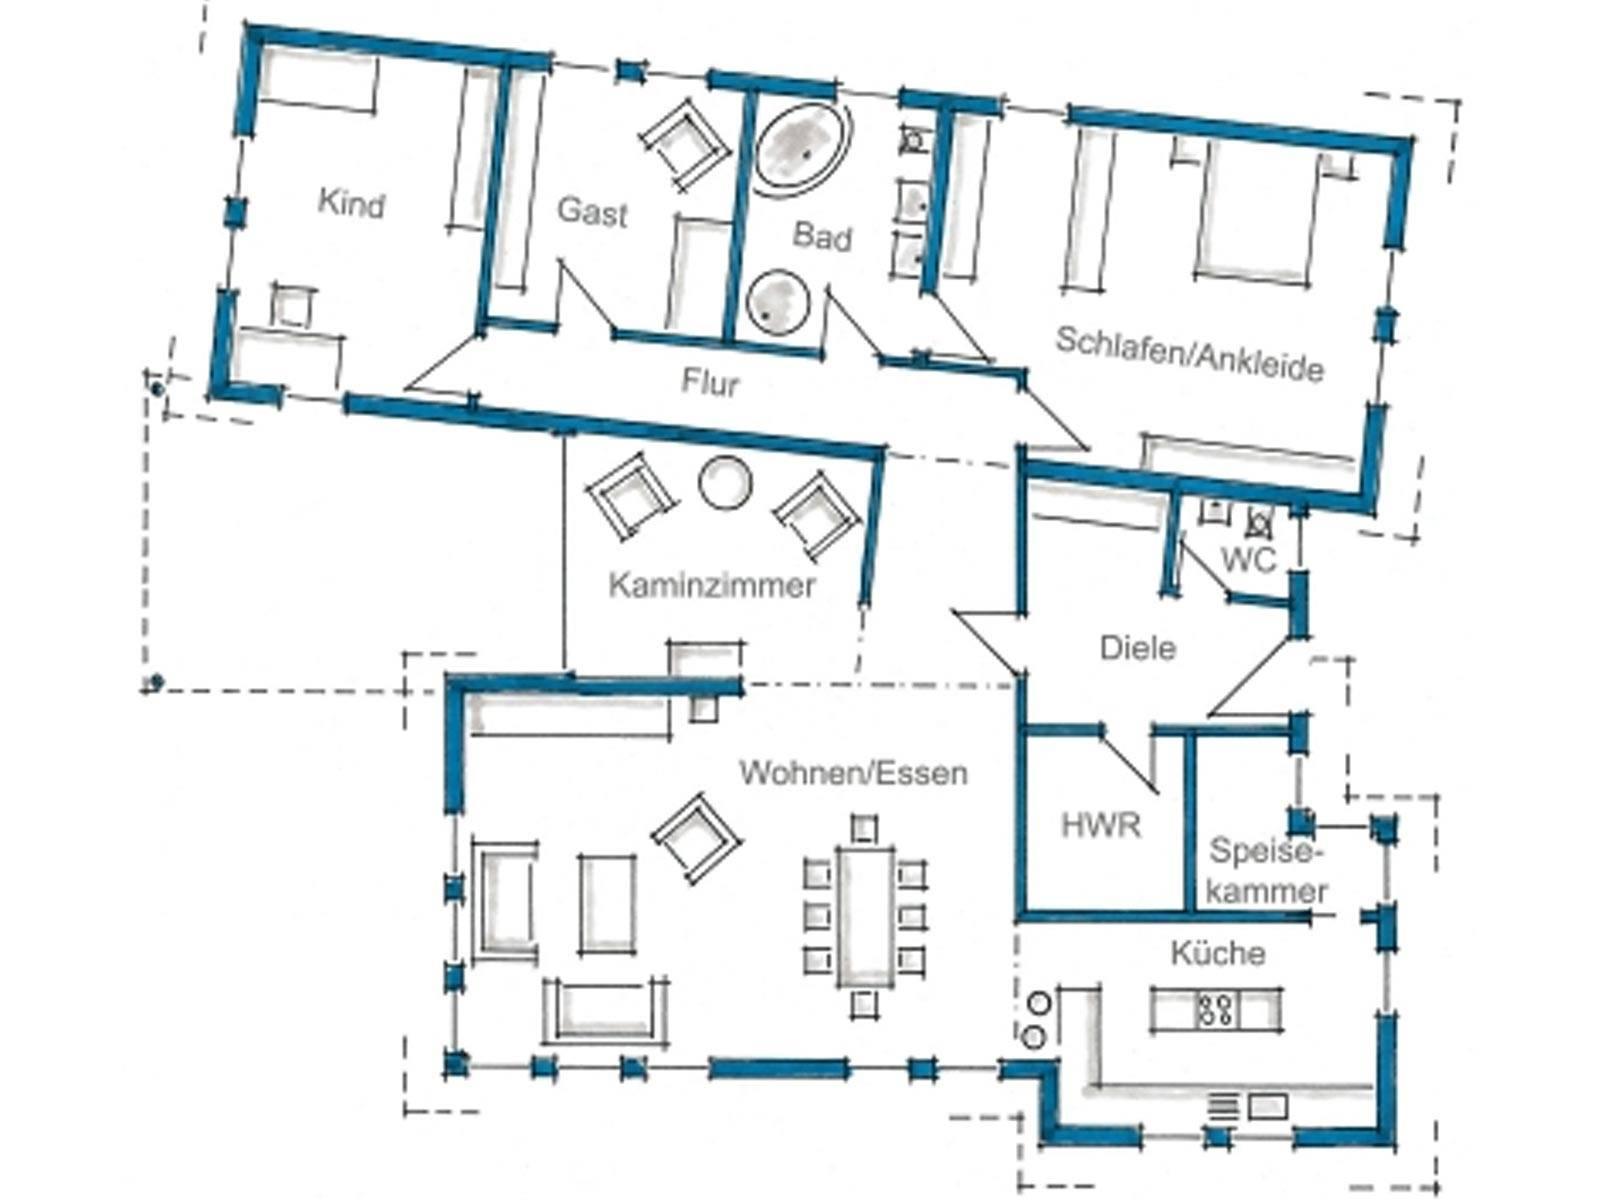 Architektenhaus ebinger fertighaus weiss for Architektenhaus grundriss